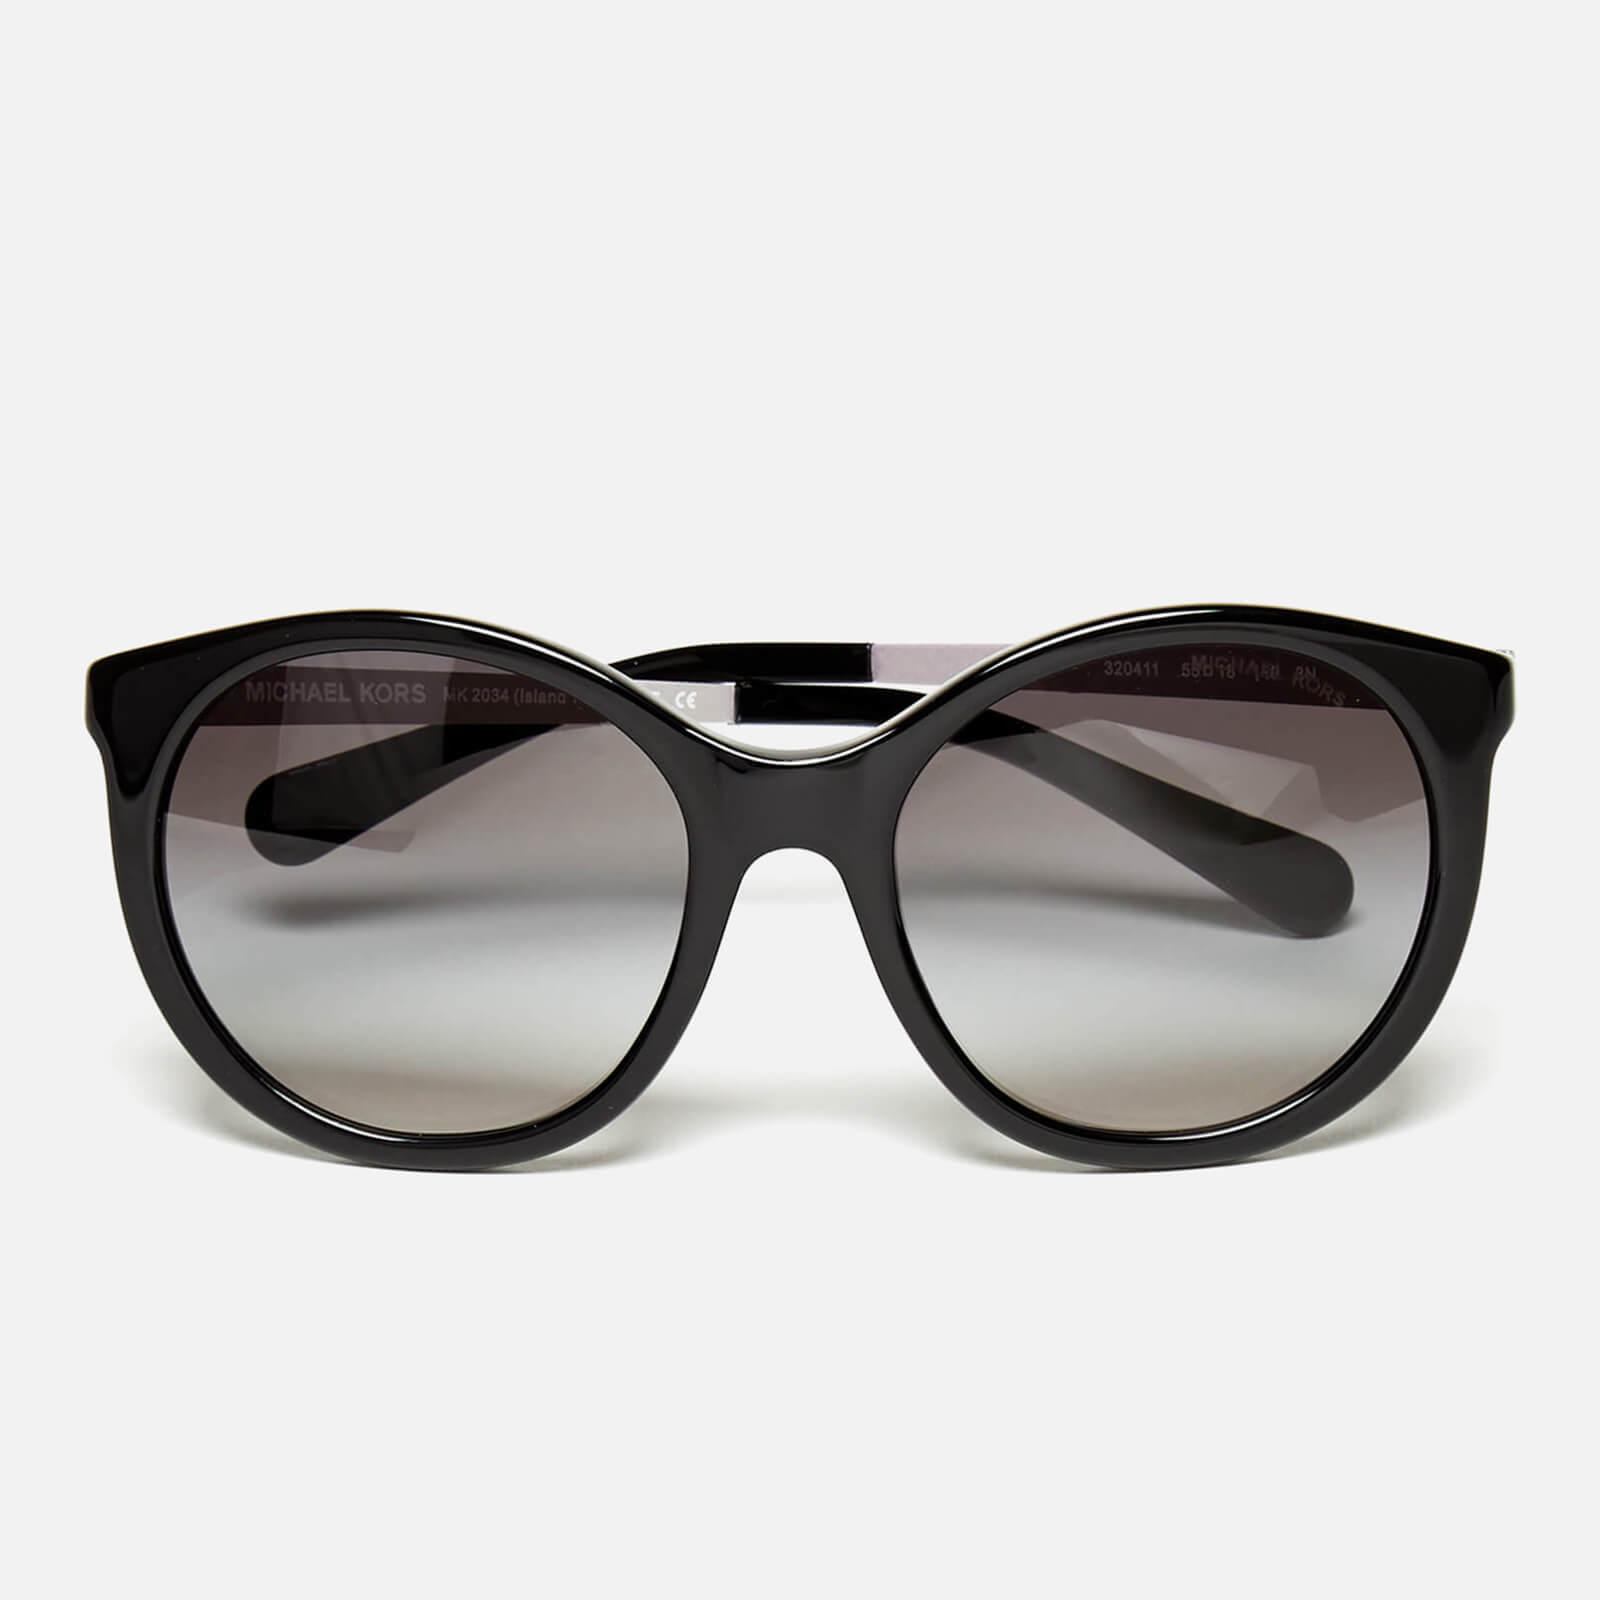 ebcade0355 MICHAEL MICHAEL KORS Women s Island Tropics Sunglasses - Black Womens  Accessories